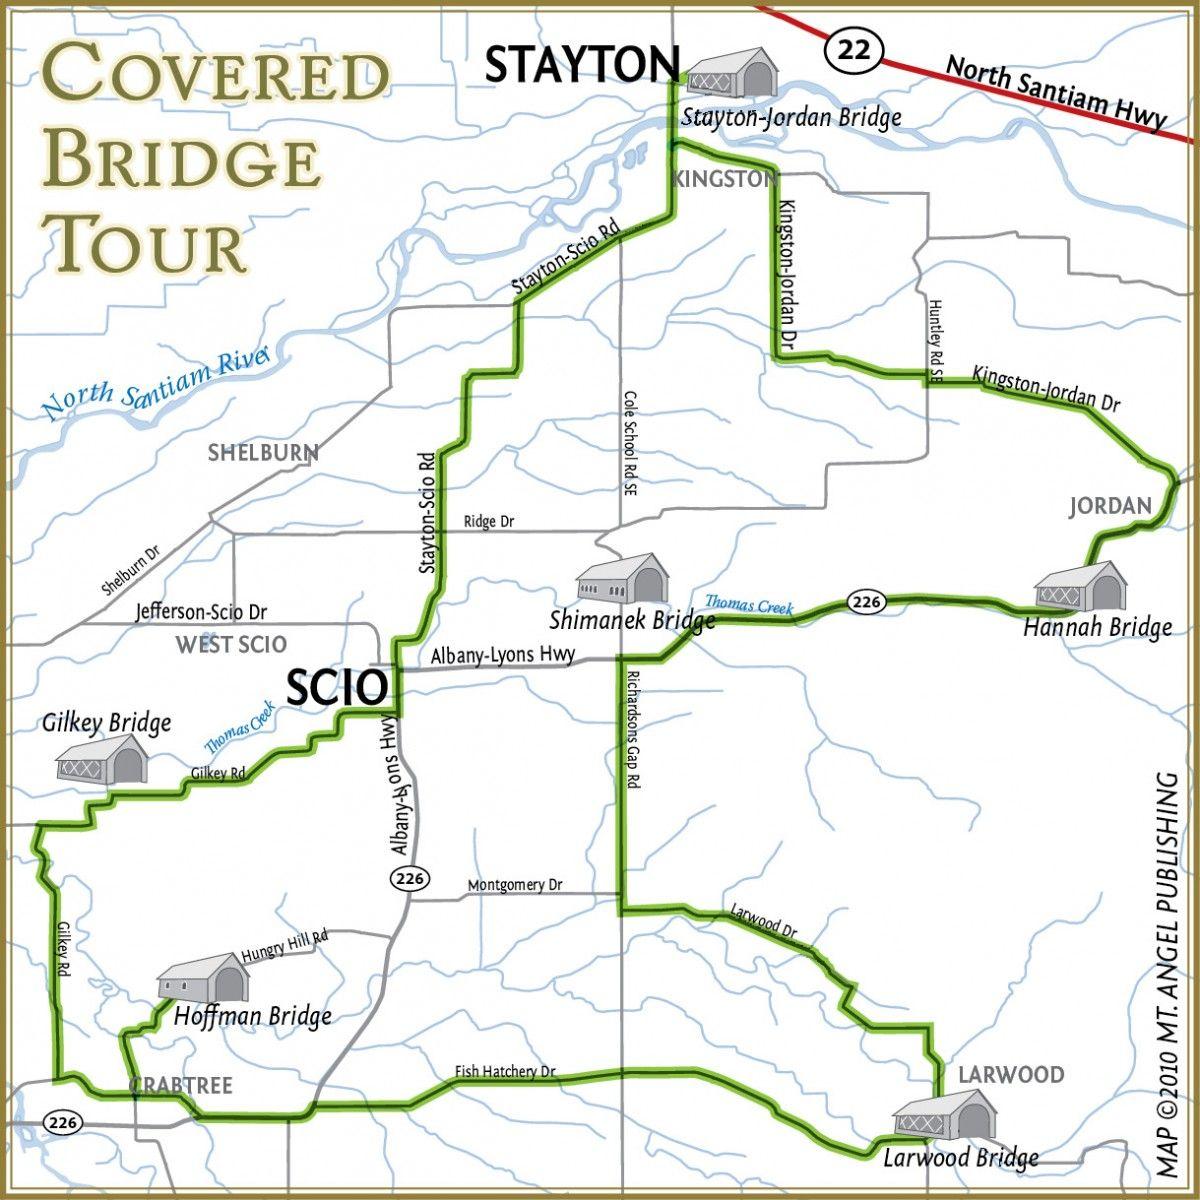 map of stayton oregon Covered Bridge Tour Covered Bridges Stayton Tours map of stayton oregon